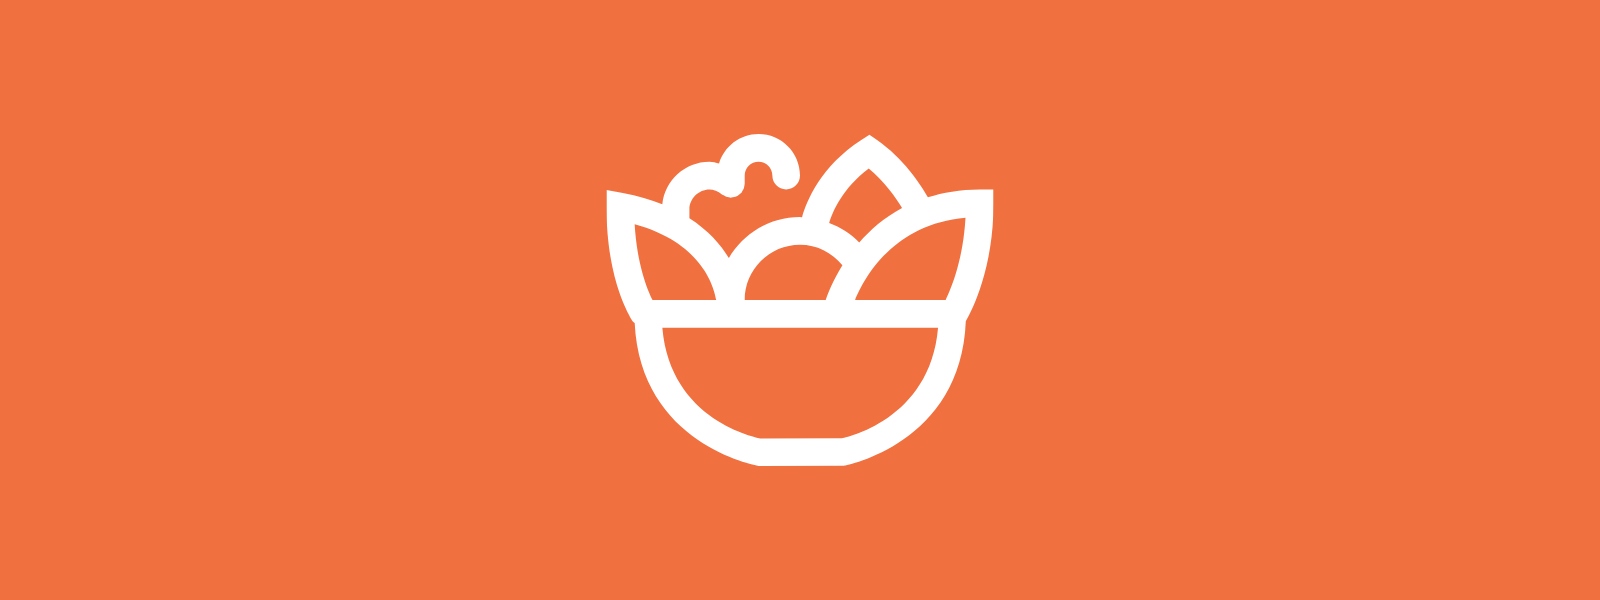 Icon background of produce bowl